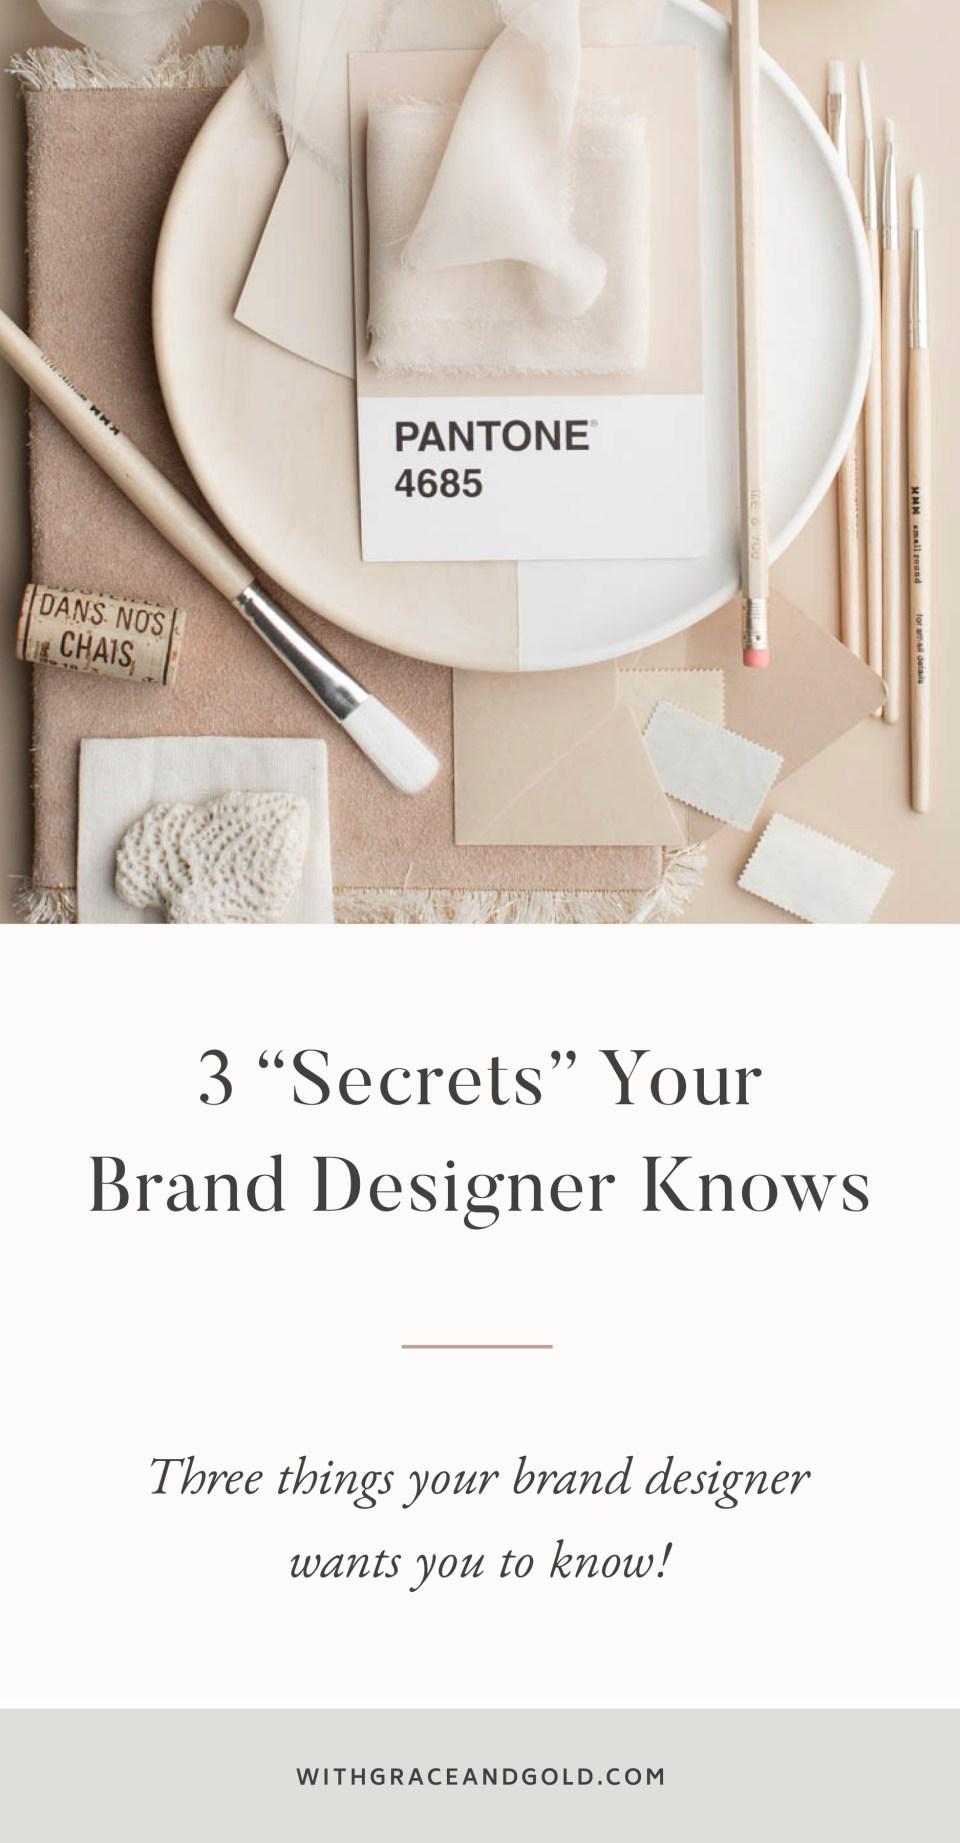 3 Secrets Your Brand Designer Knows